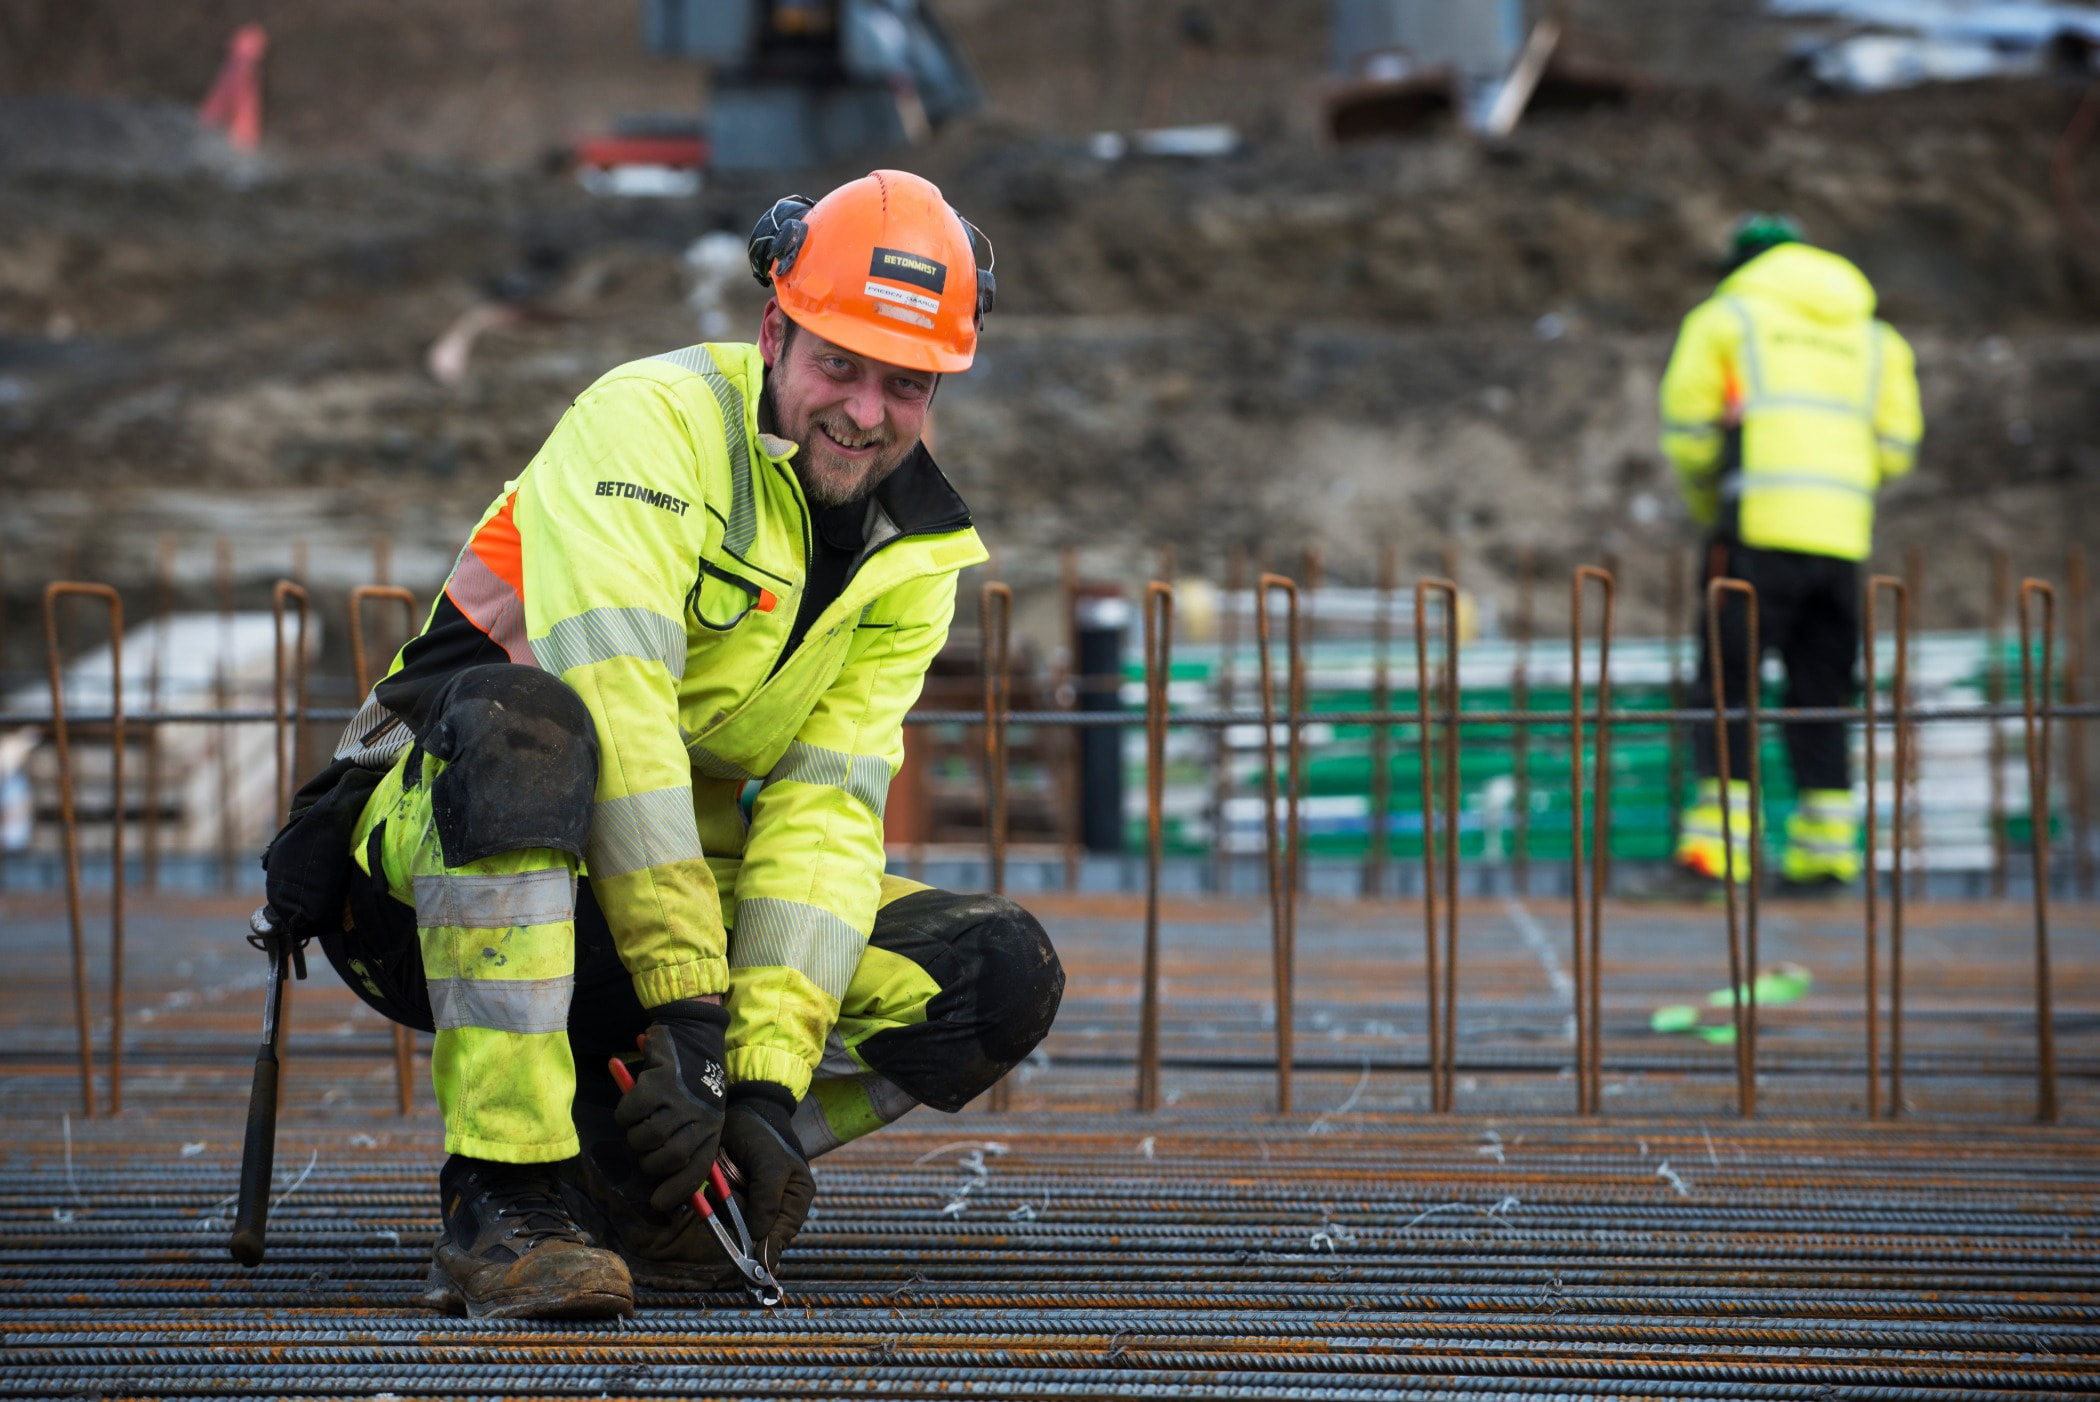 High-visibility clothing, Construction worker, Asphalt, Transport